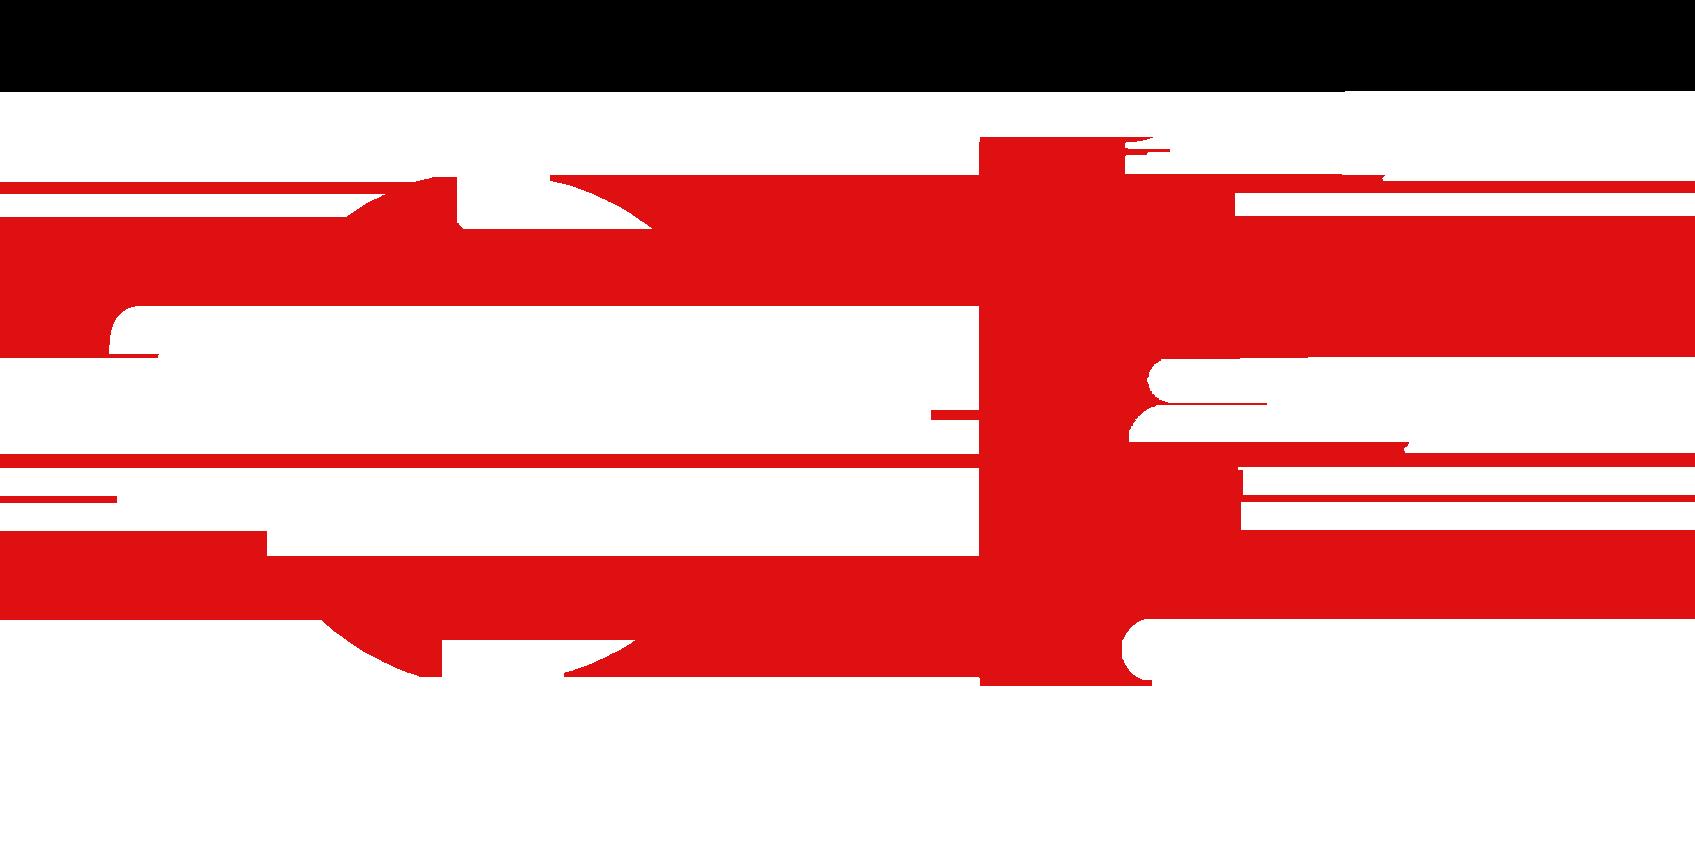 August Motorcars Social Media Influence